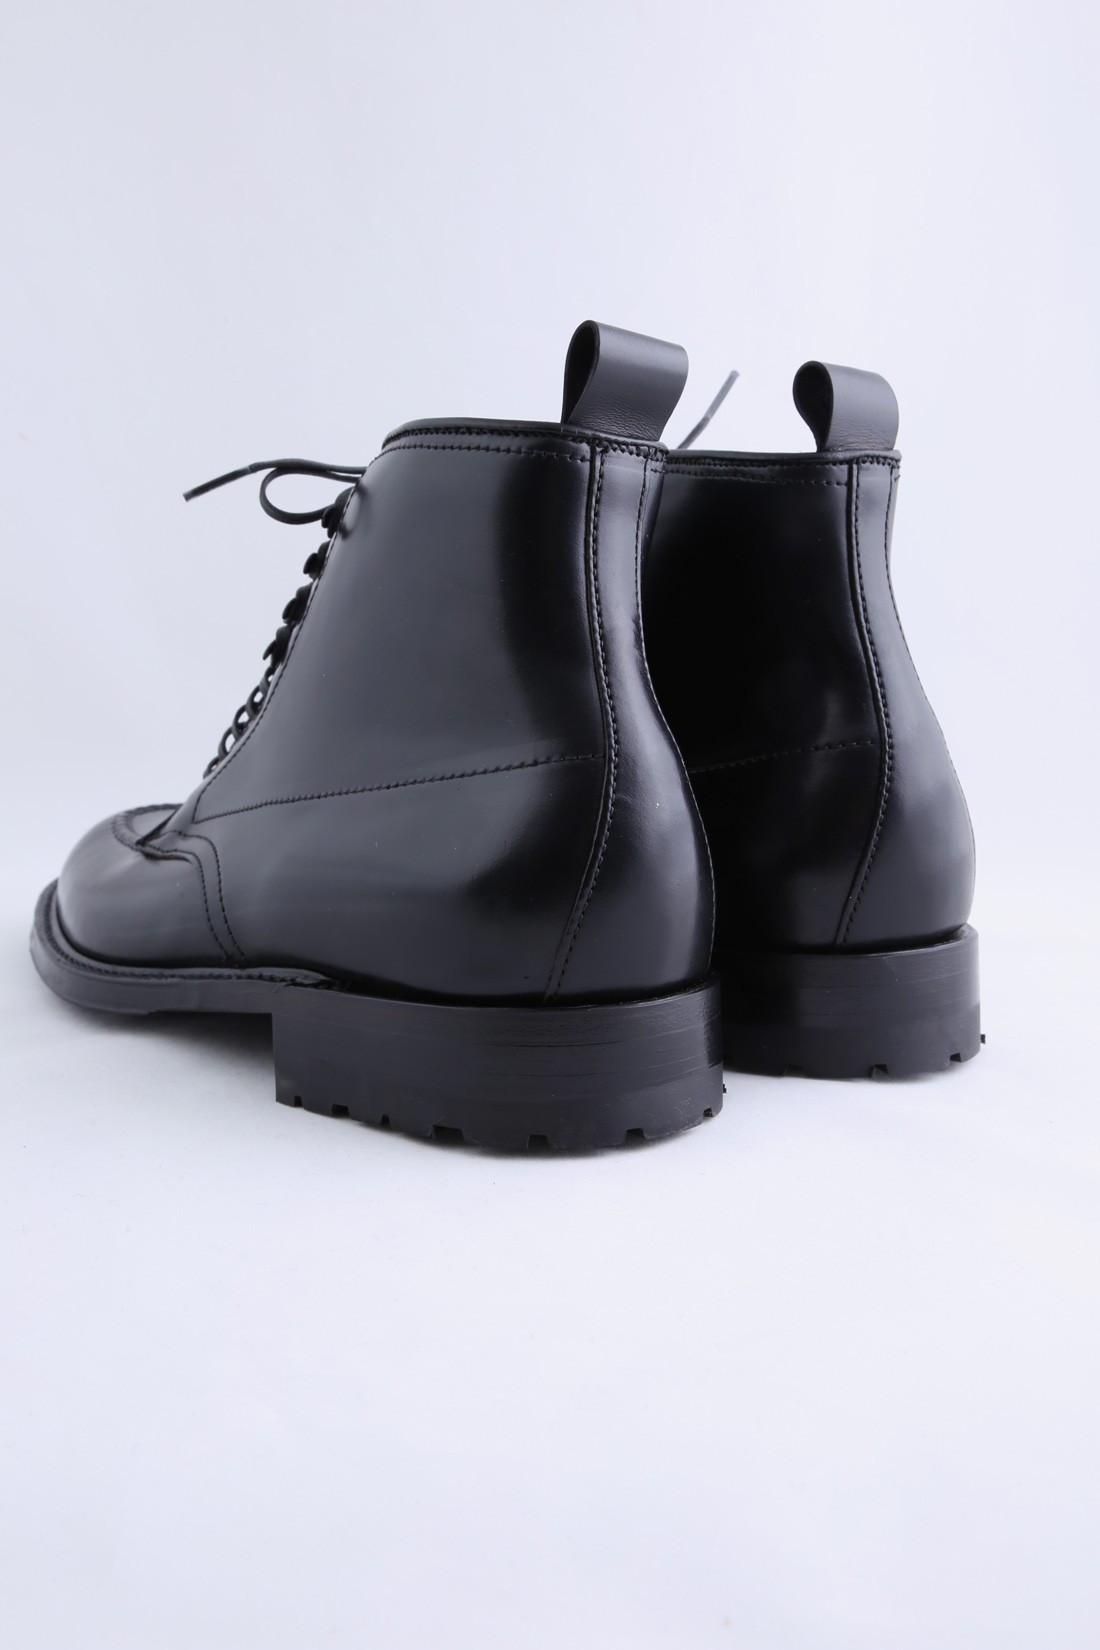 ALDEN SHOE COMPANY / 40509hc indy boots cordovan Black